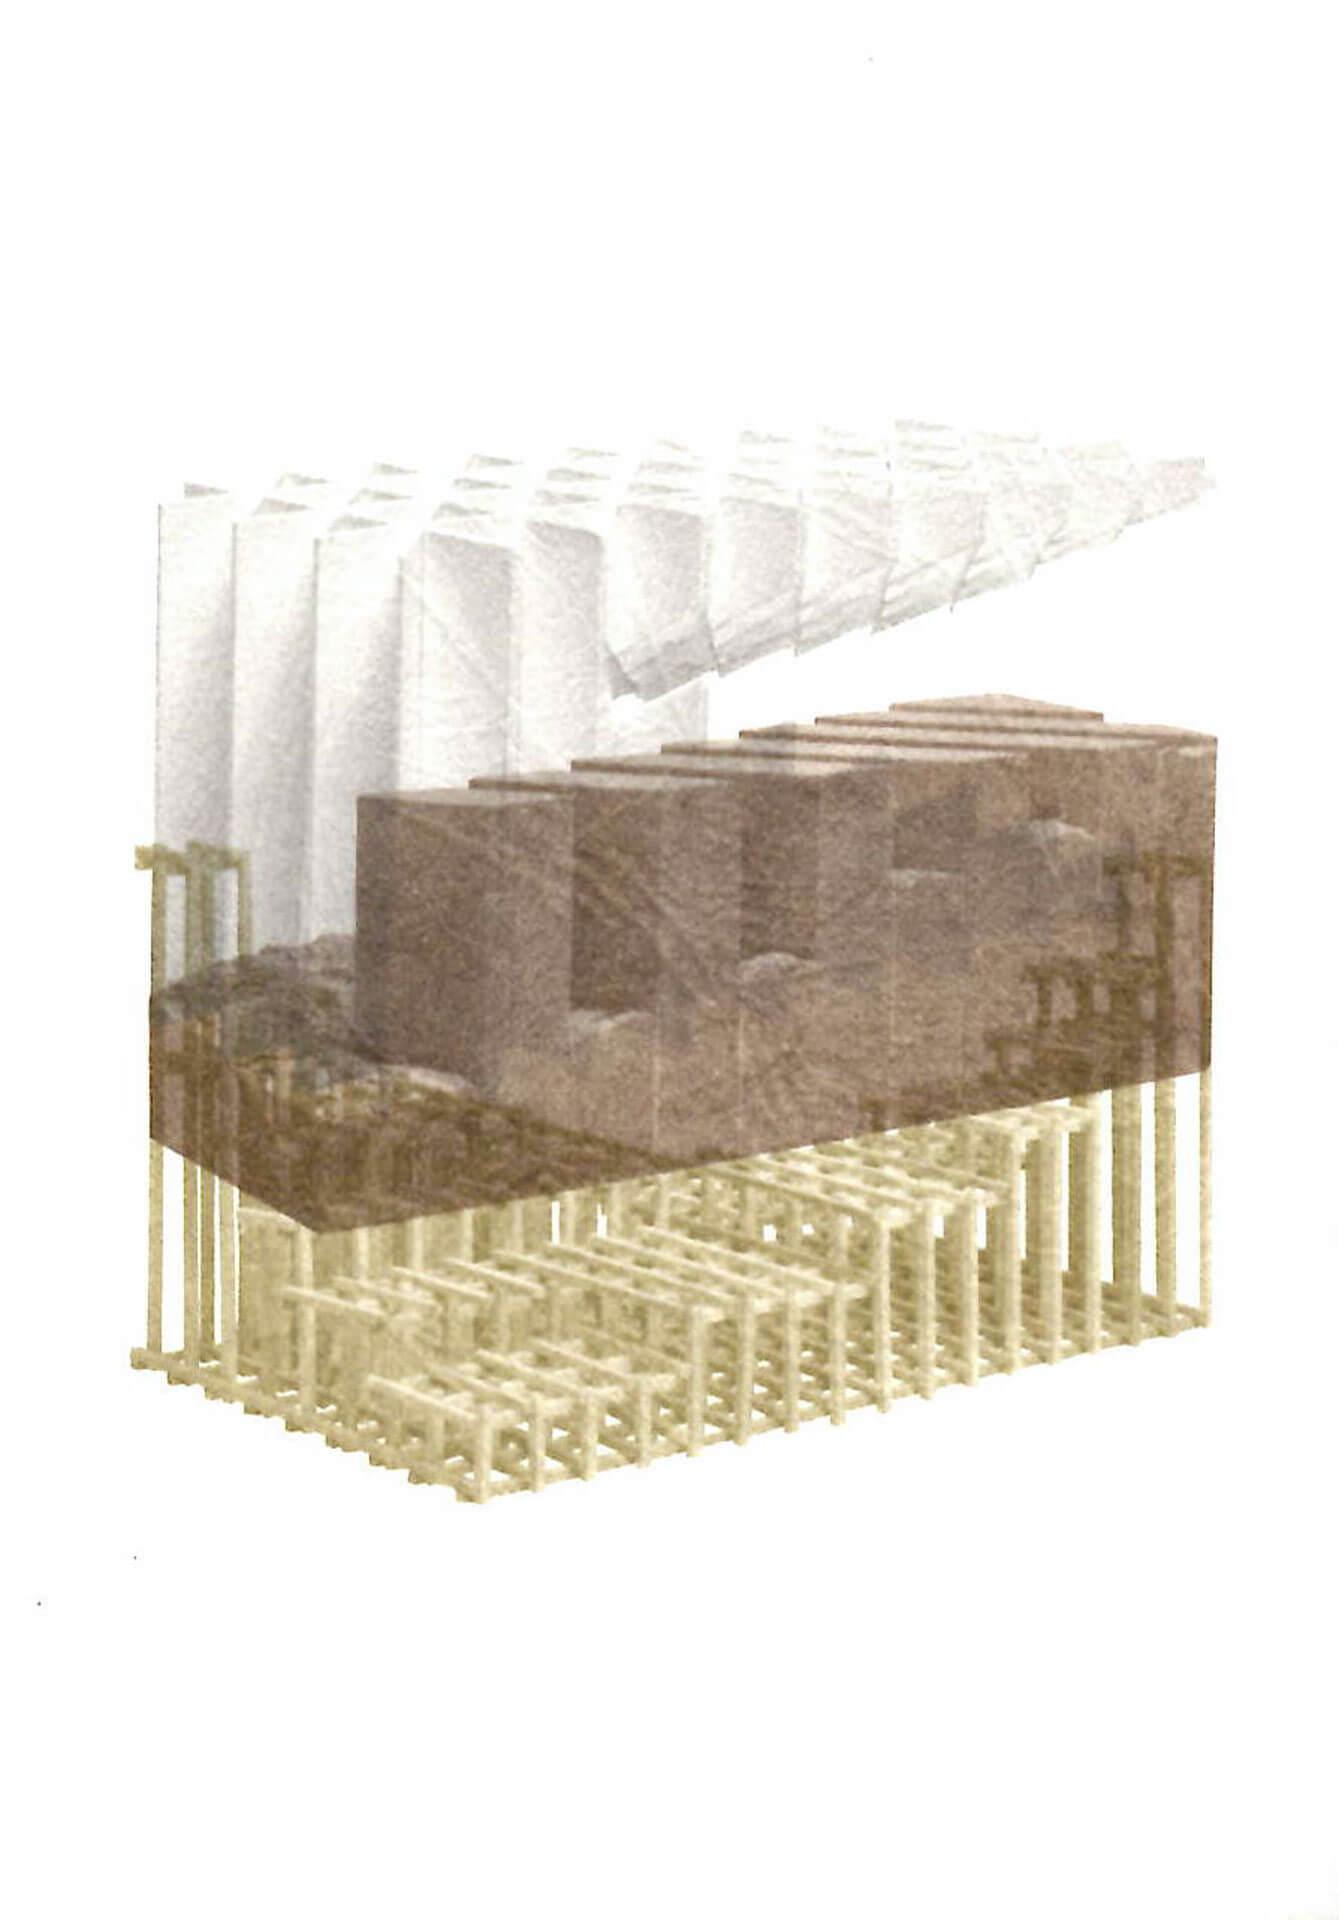 Studio Stefania Miscetti | Catalogues | Labics | Structures